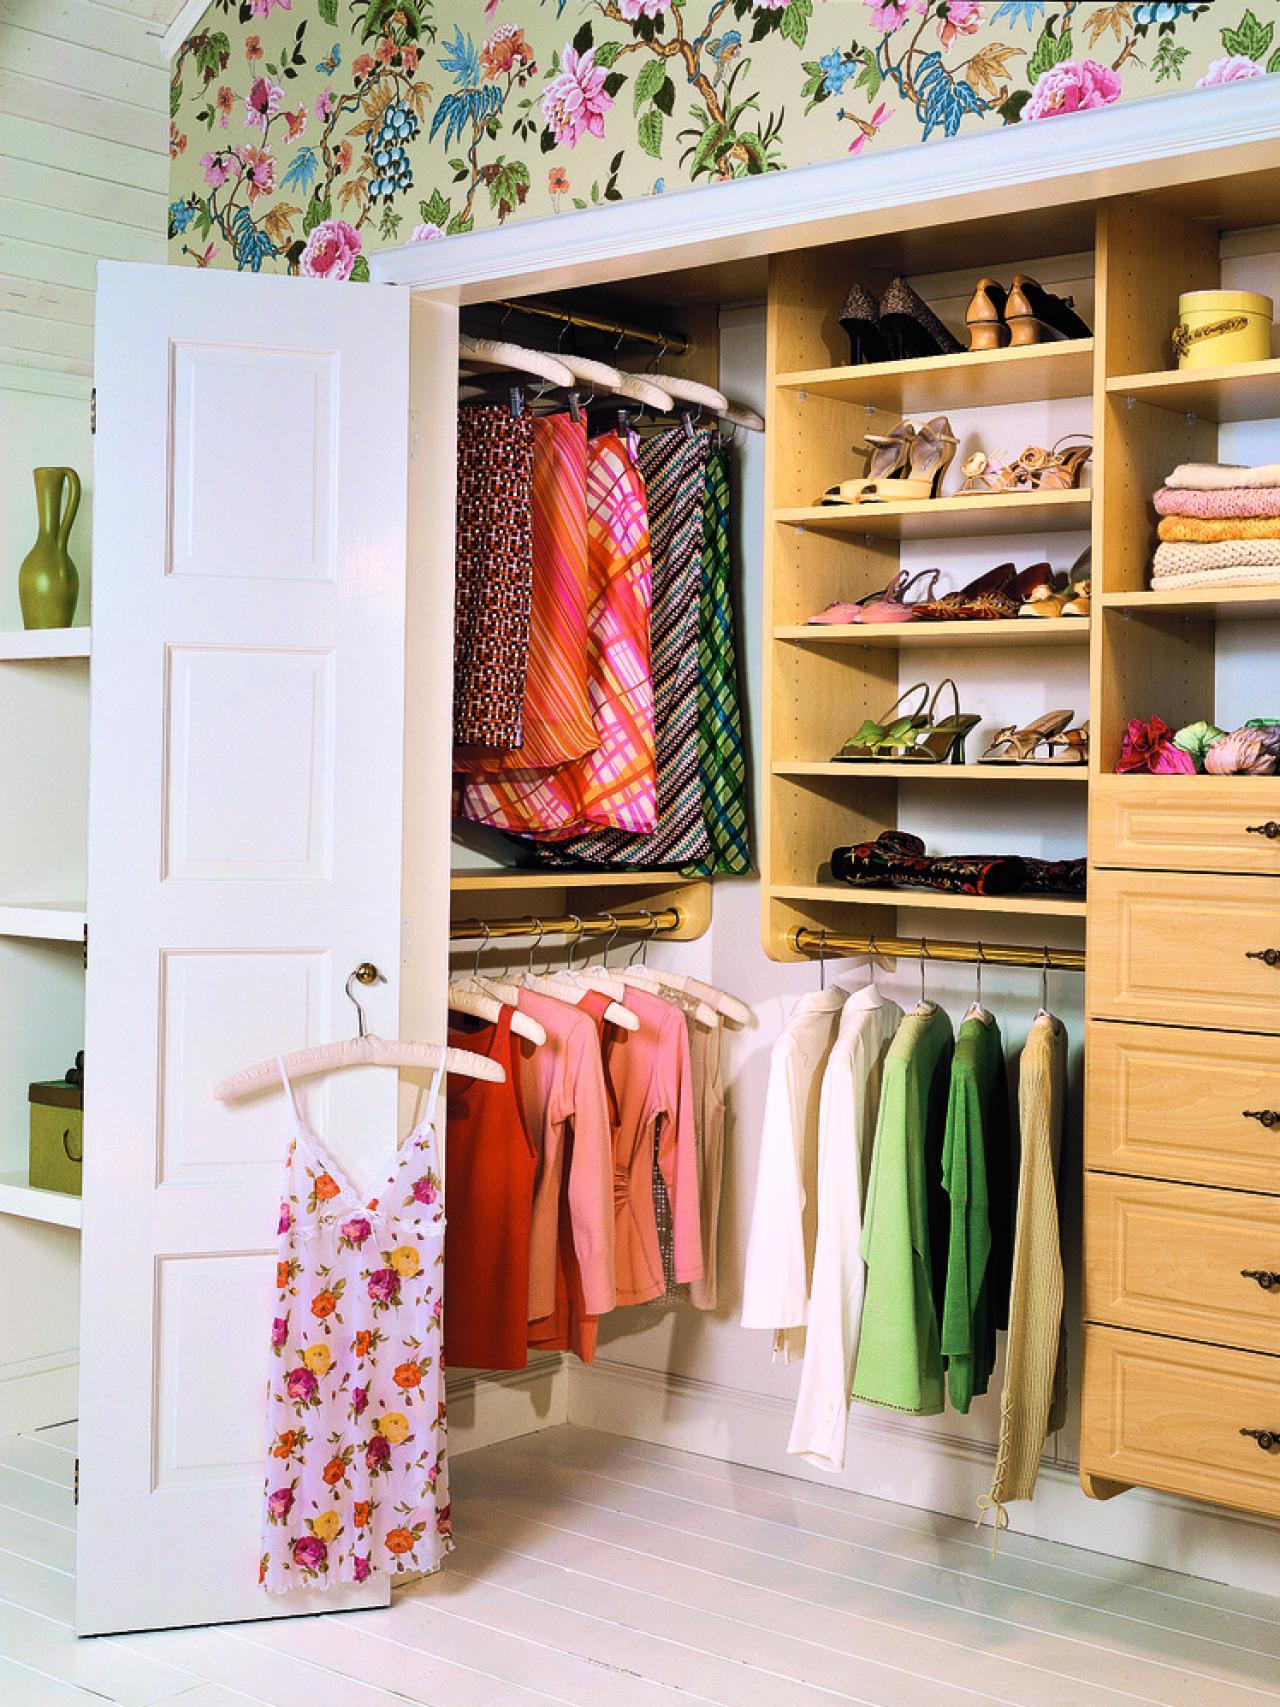 how-to-organize-your-clothes-wardrobe-storage-shelves-handbags-shoes-folded-california-closets.jpeg